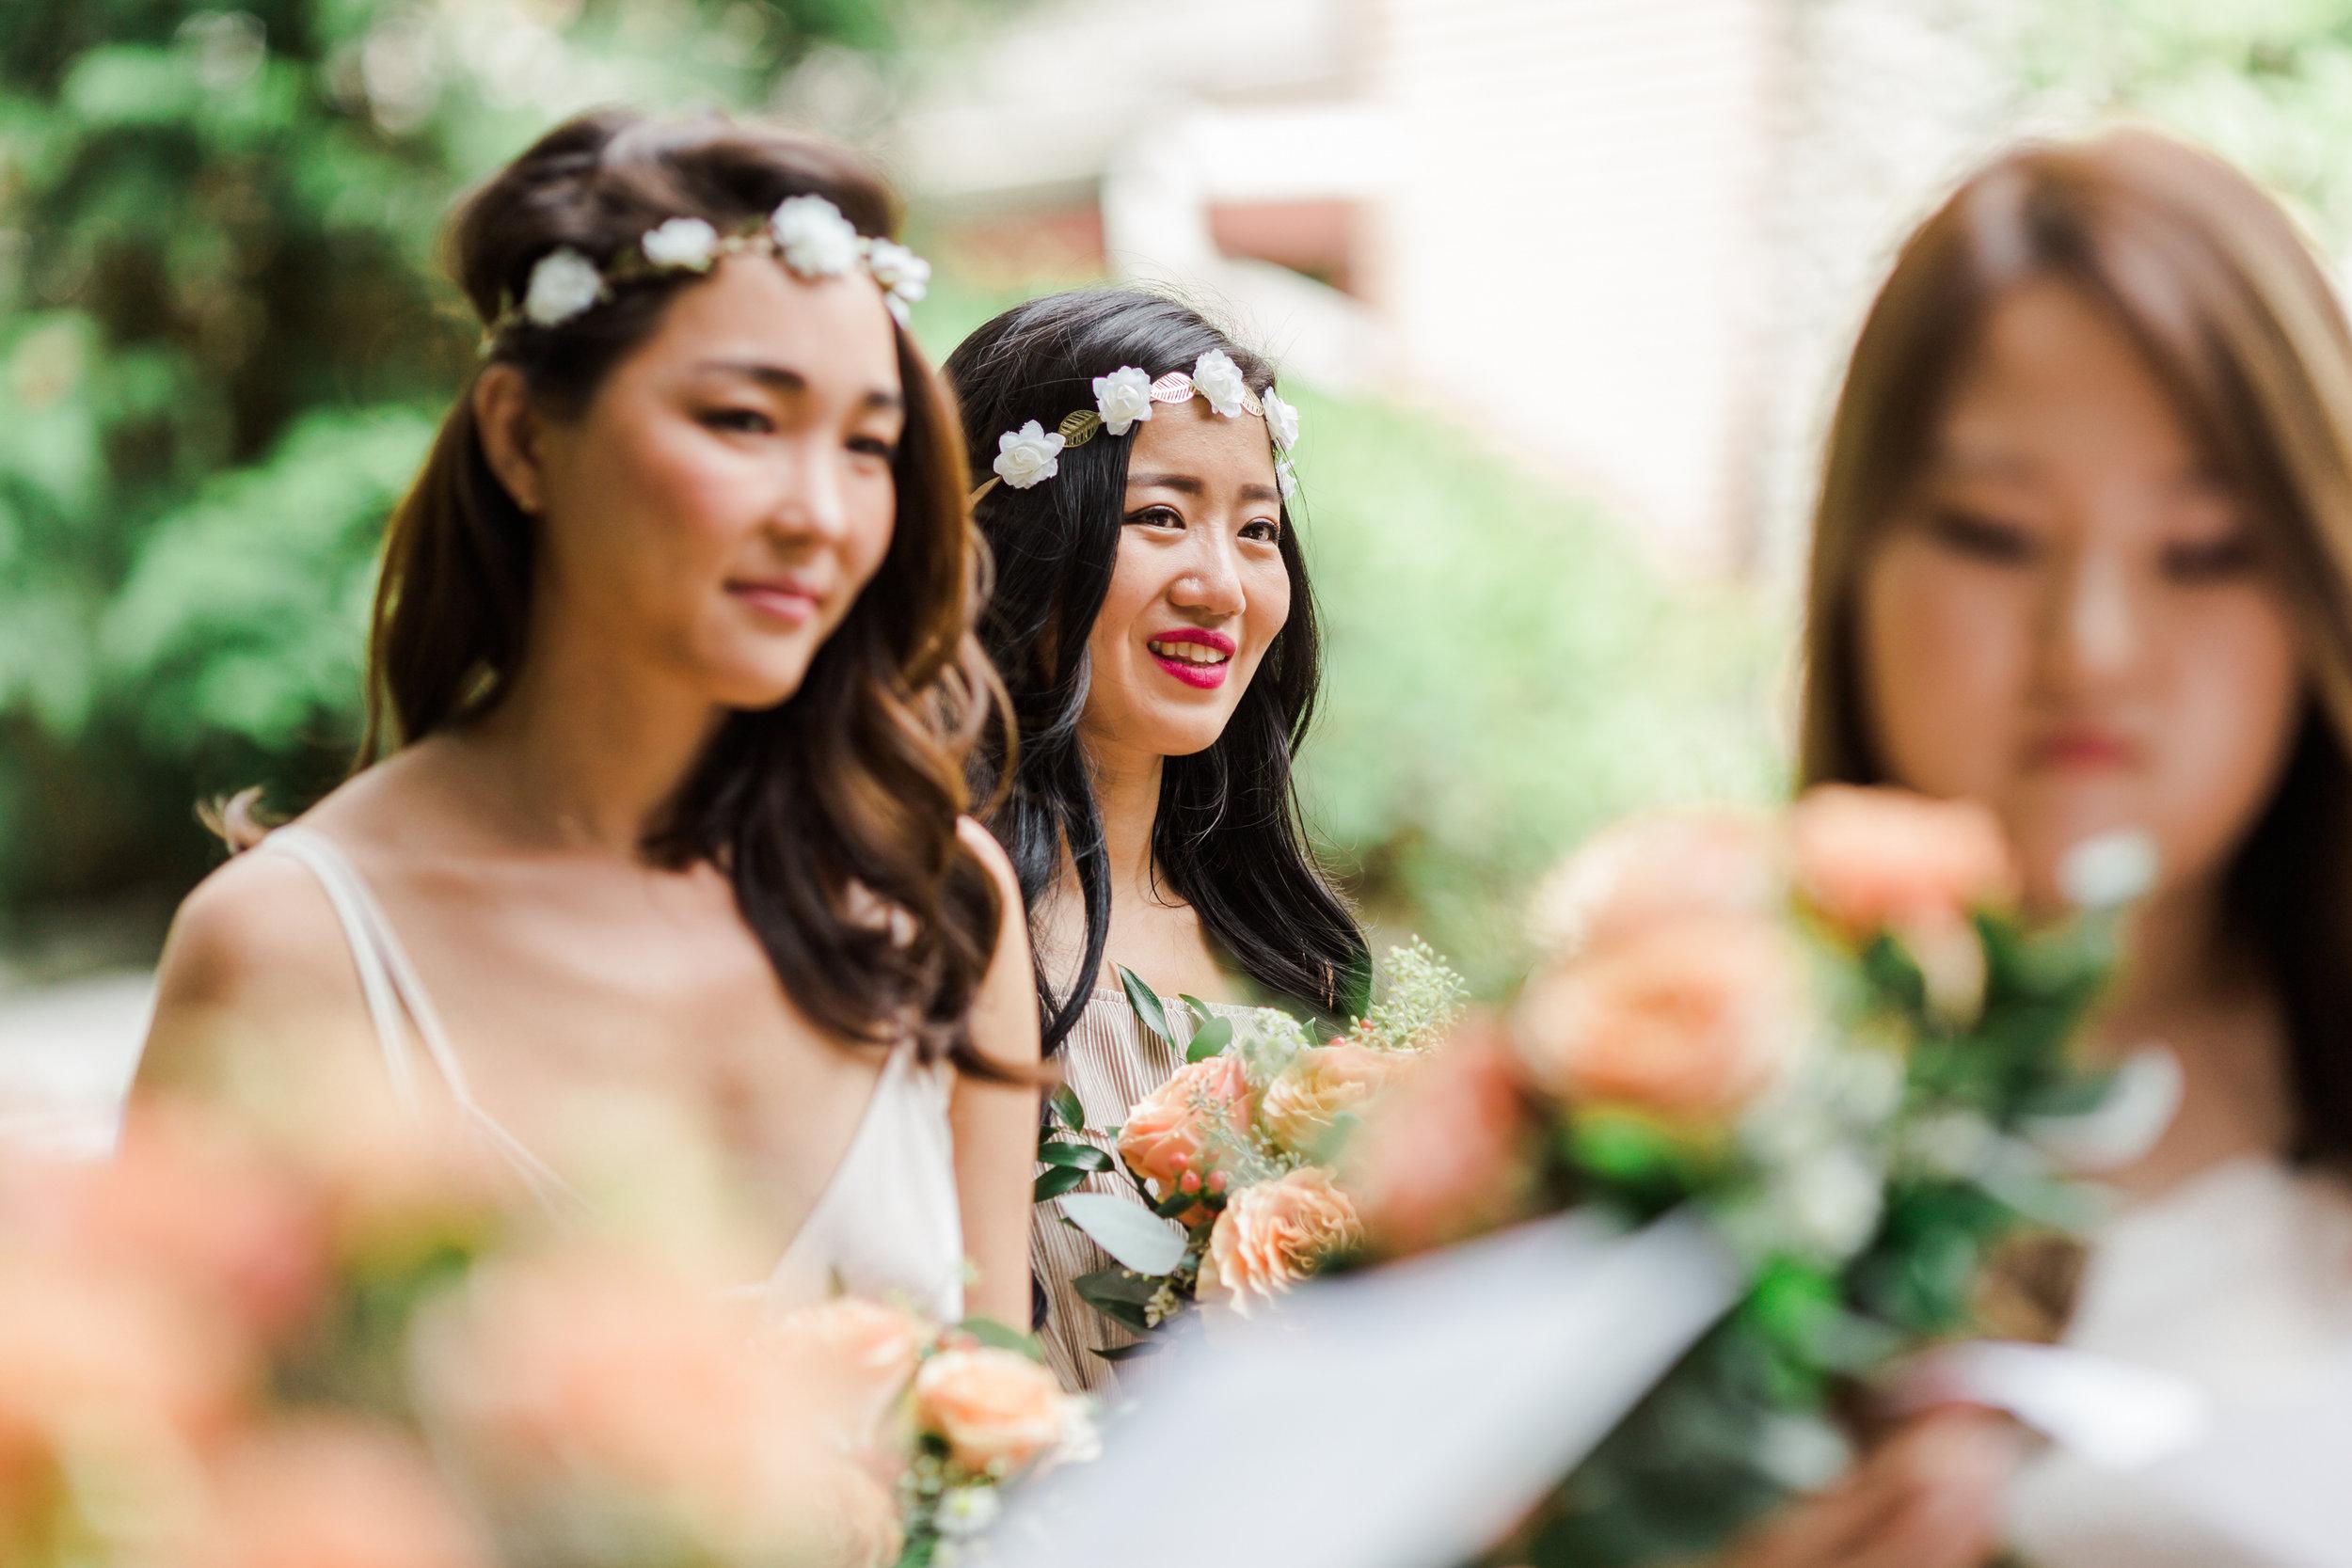 Linwood House Wedding Photos - Roberts Creek Wedding Photos - Vancouver Wedding Photographer & Videographer - Sunshine Coast Wedding Photos - Sunshine Coast Wedding Photographer - Jennifer Picard Photography - IMG_0920.jpg